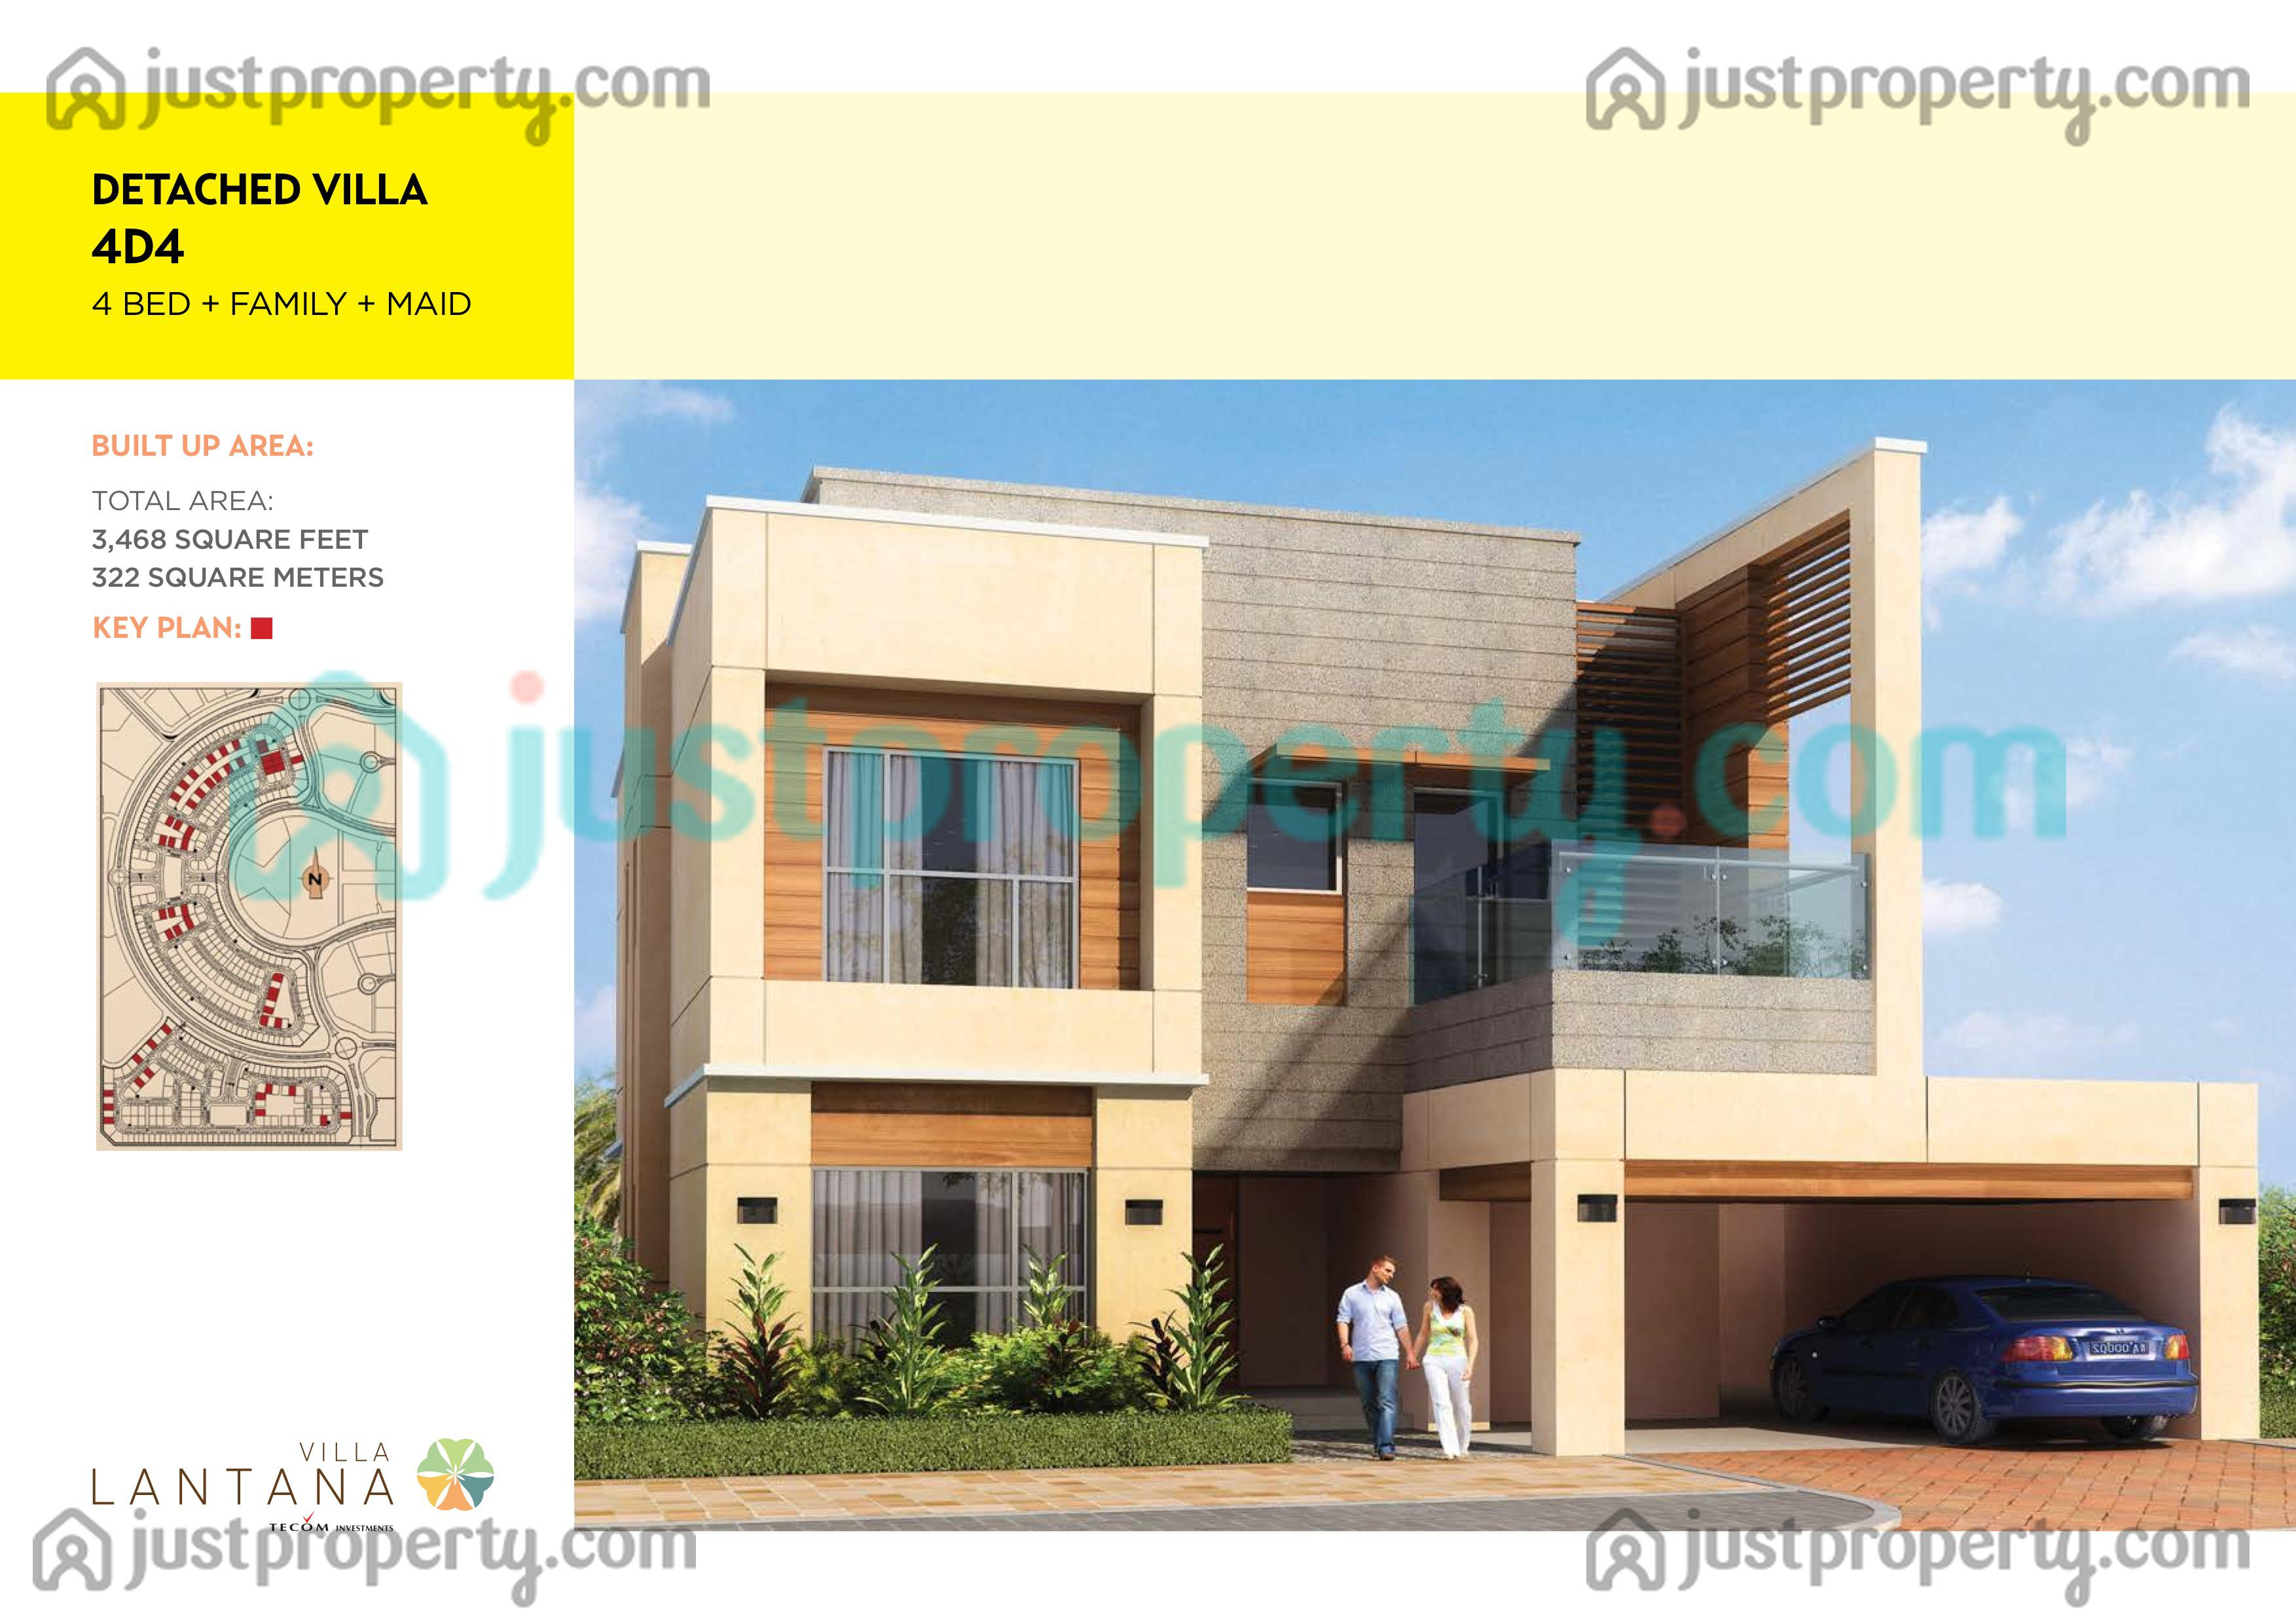 lantana villas floor plans justproperty com floor plans lantana hills